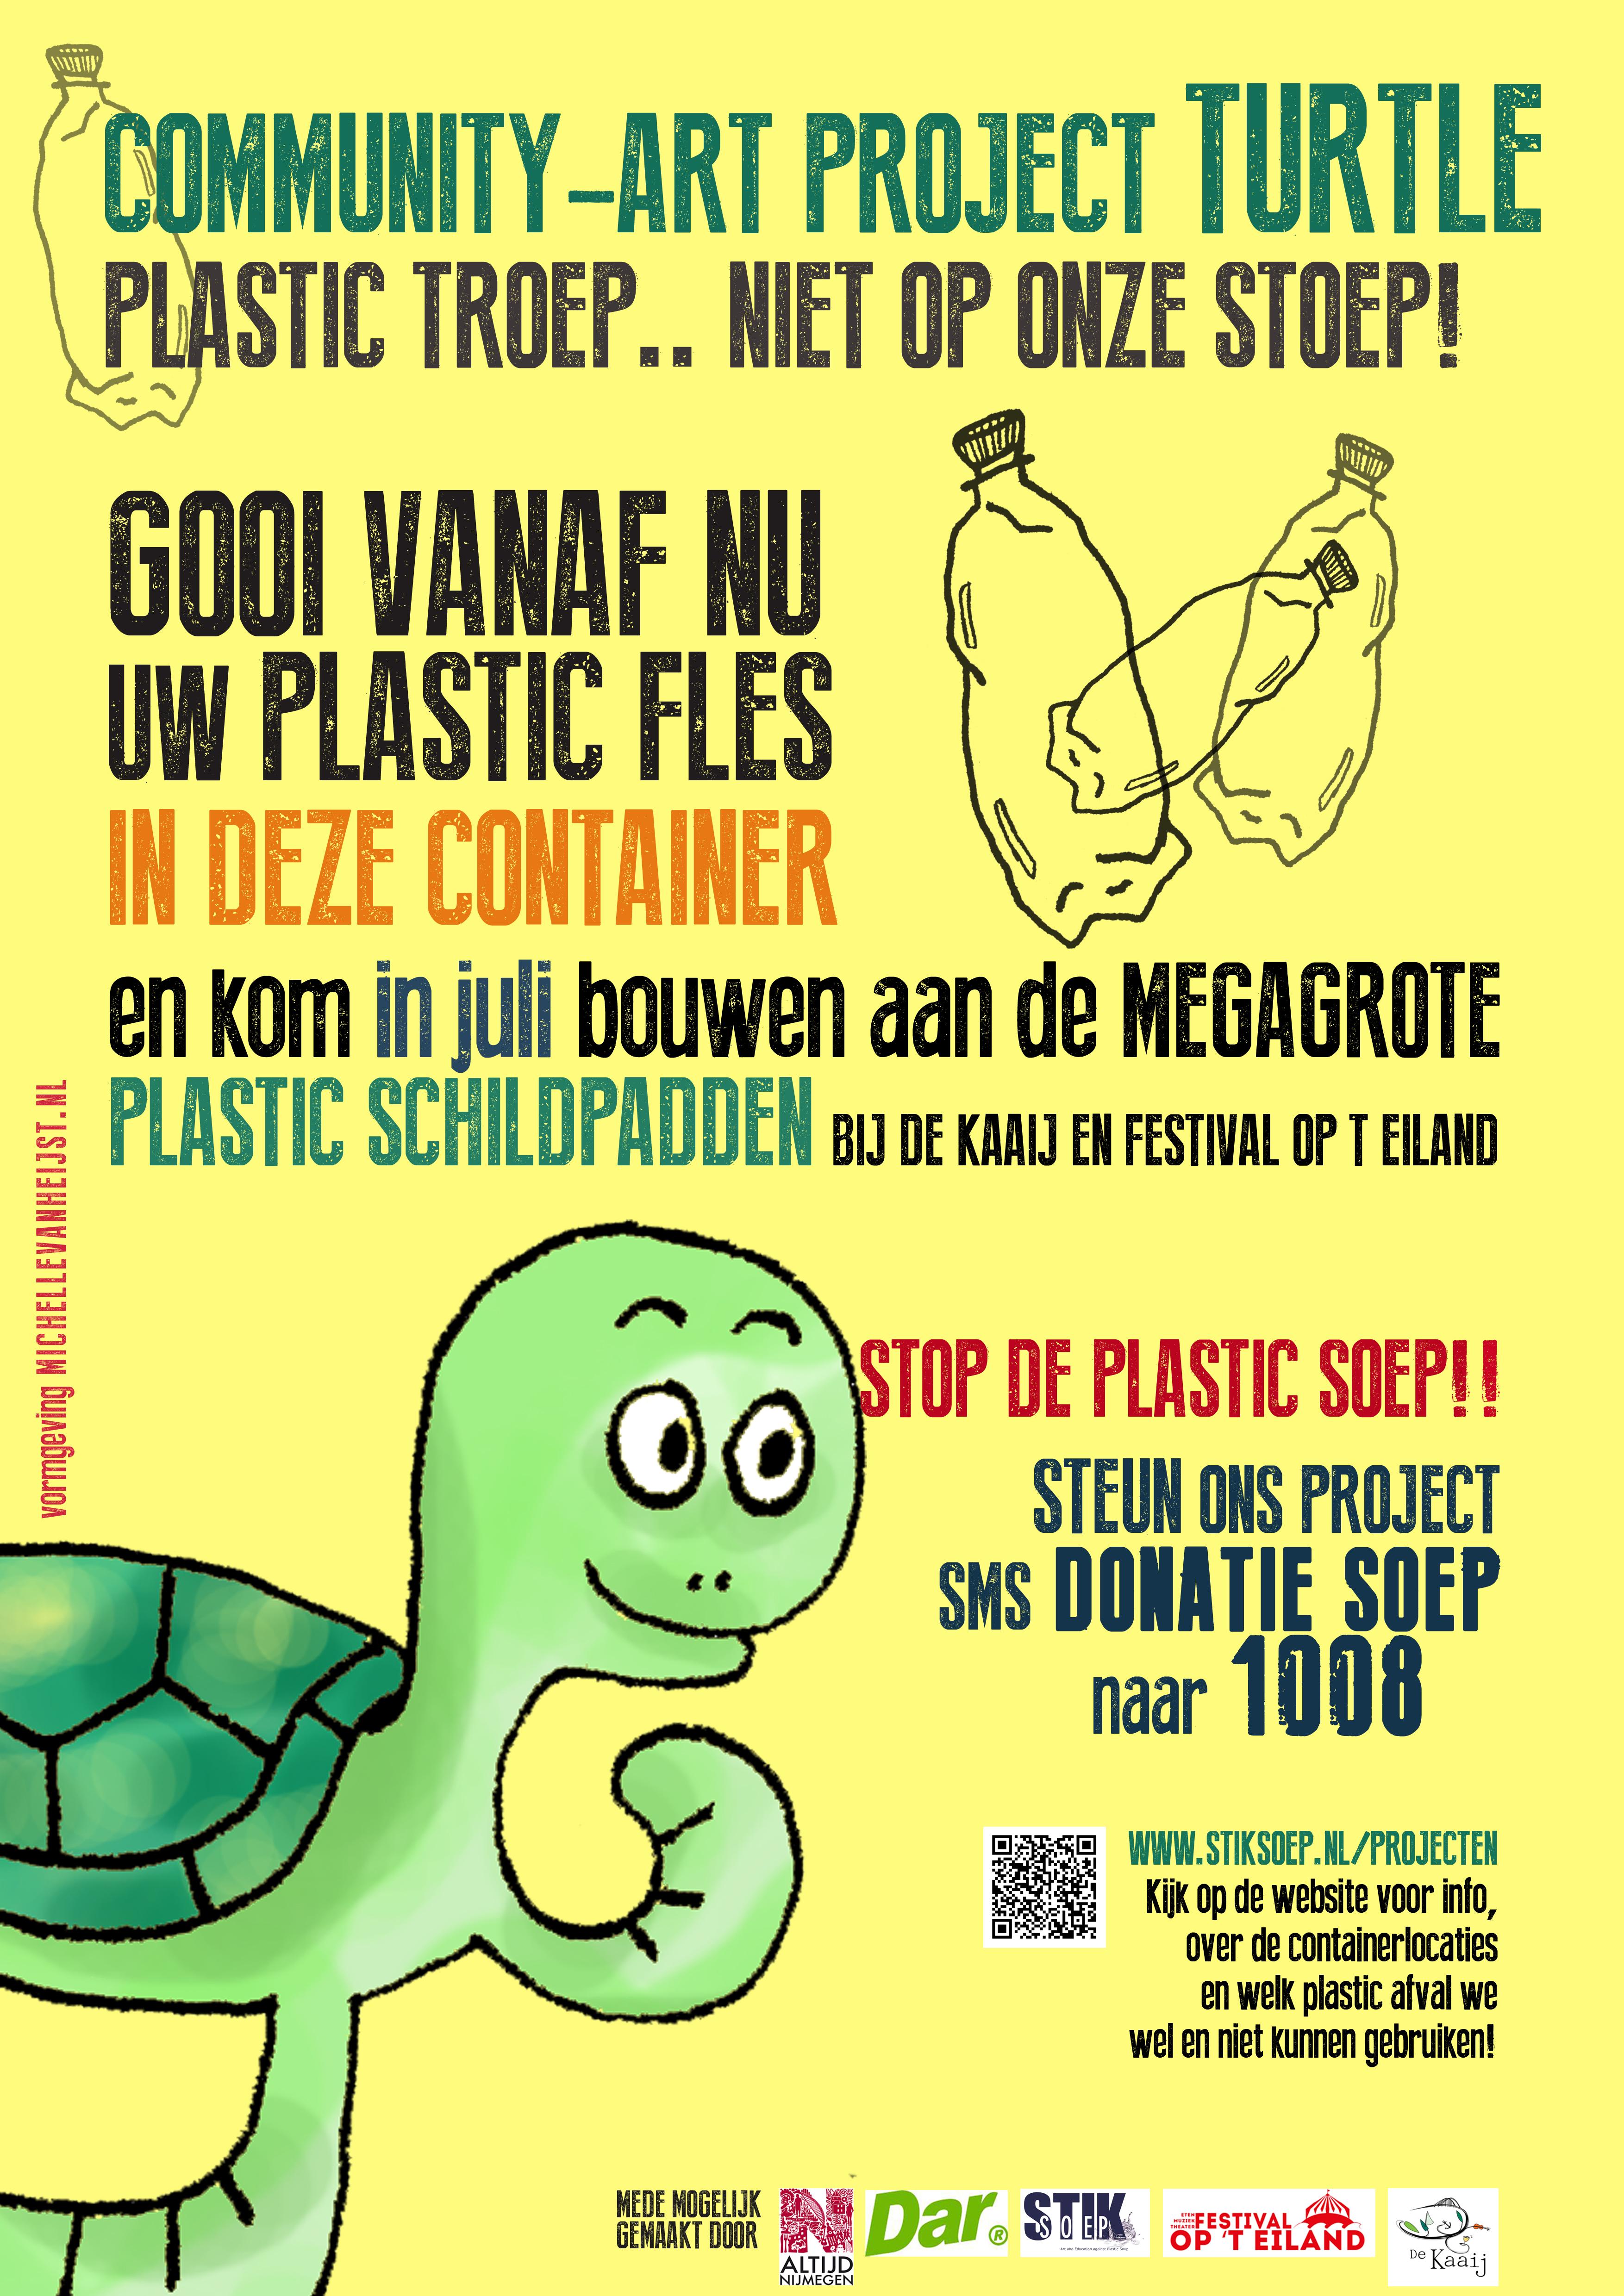 Turtle container plakken